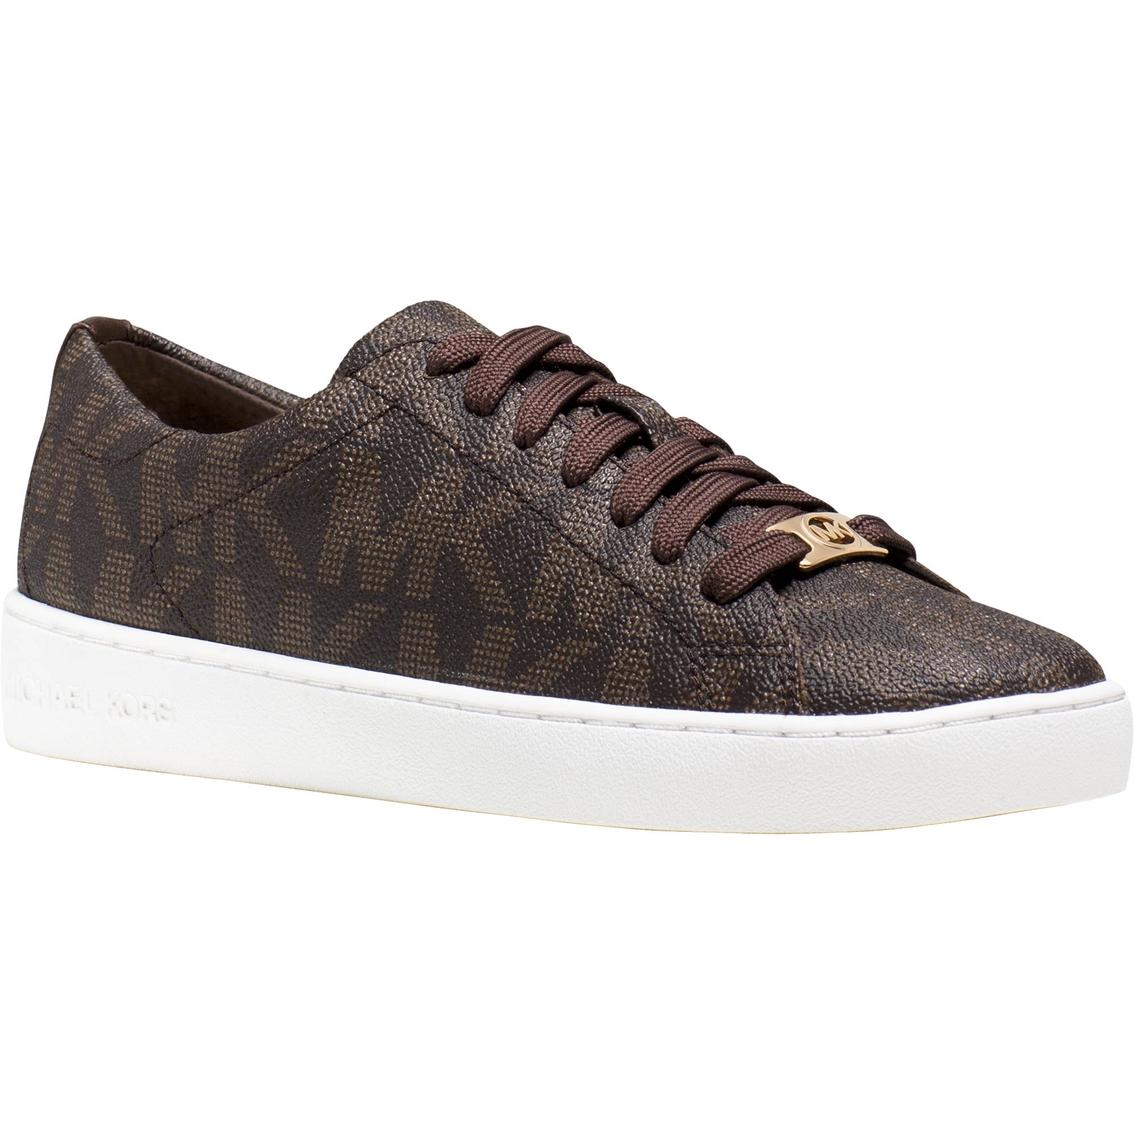 c708eb13c4 Michael Kors Women's Keaton Lace Up Sneakers | Casuals | Shoes ...